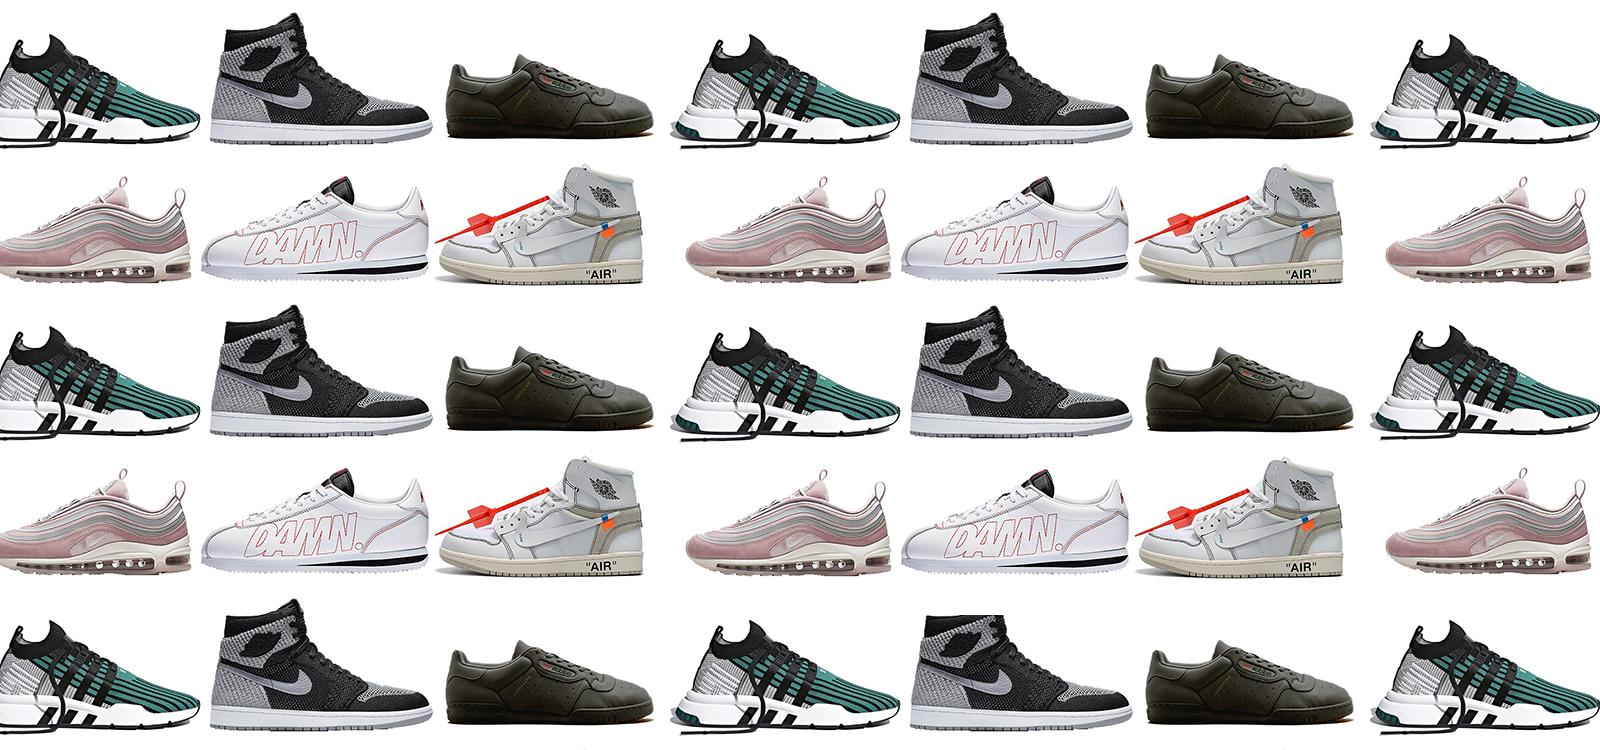 Top Sneaker Releases of 2018 So Far